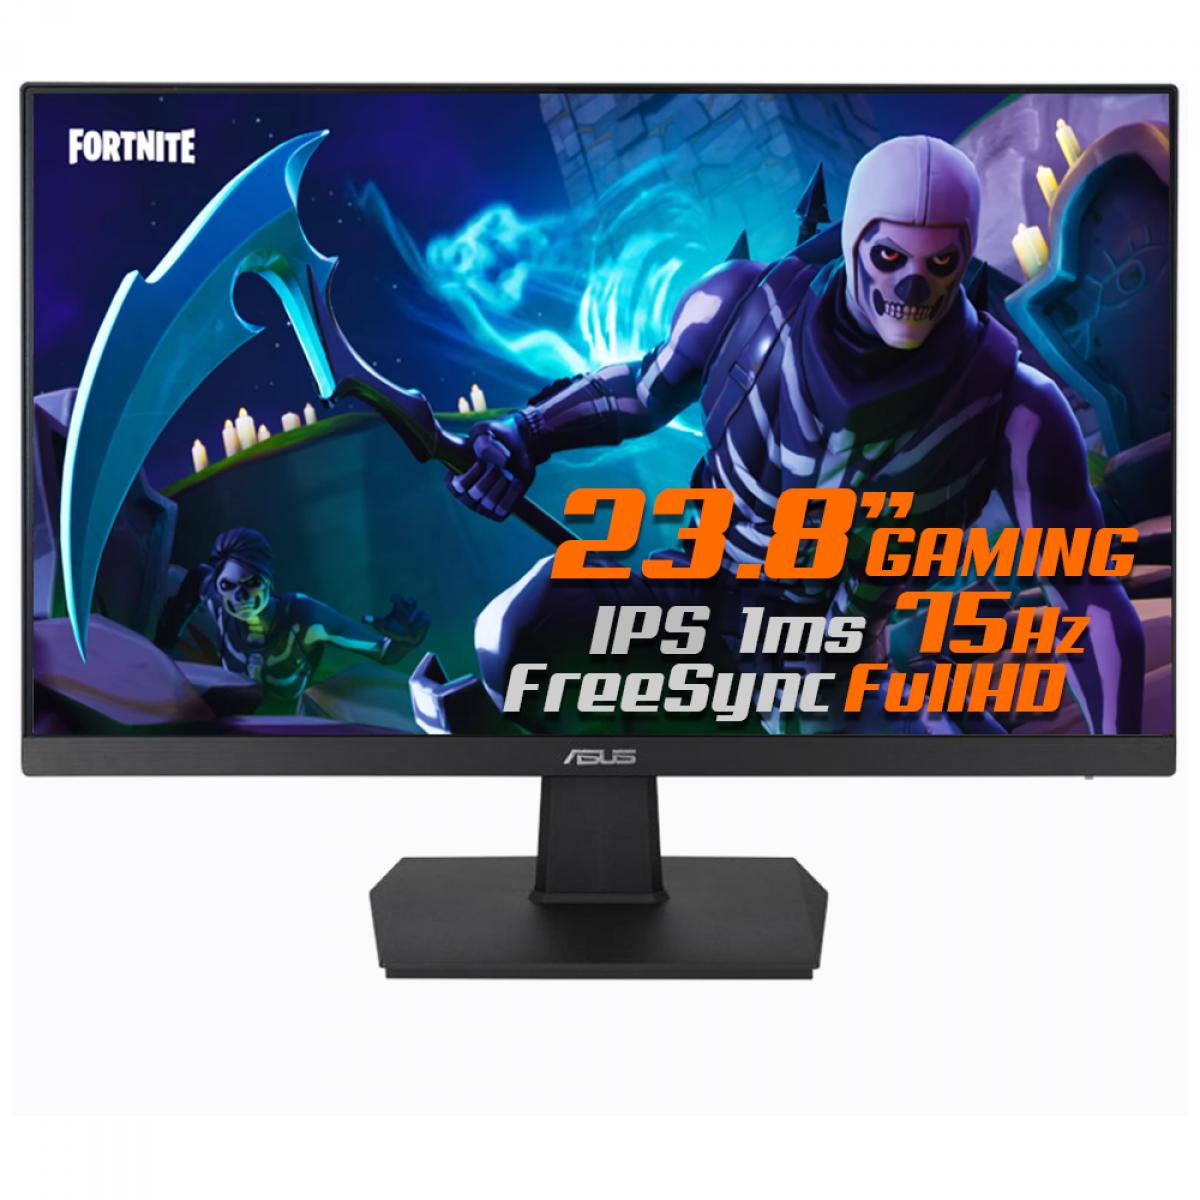 Monitor Gamer Asus Eye Care 23,8 Pol, Widescreen, Full HD, FreeSync, HDMI, IPS, VA24EHE